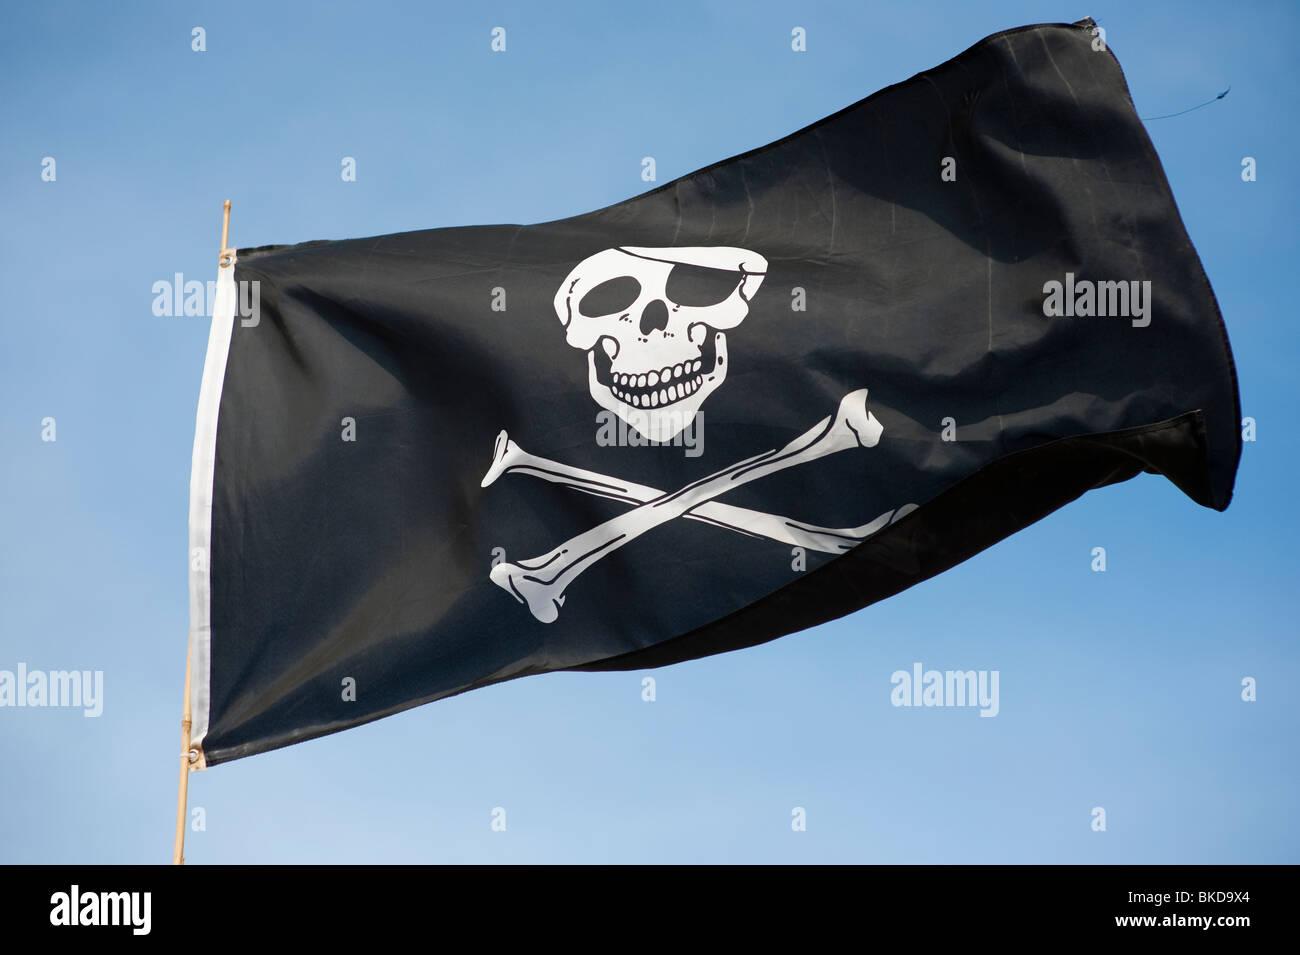 skull and crossbones jolly roger pirate banner flag - Stock Image